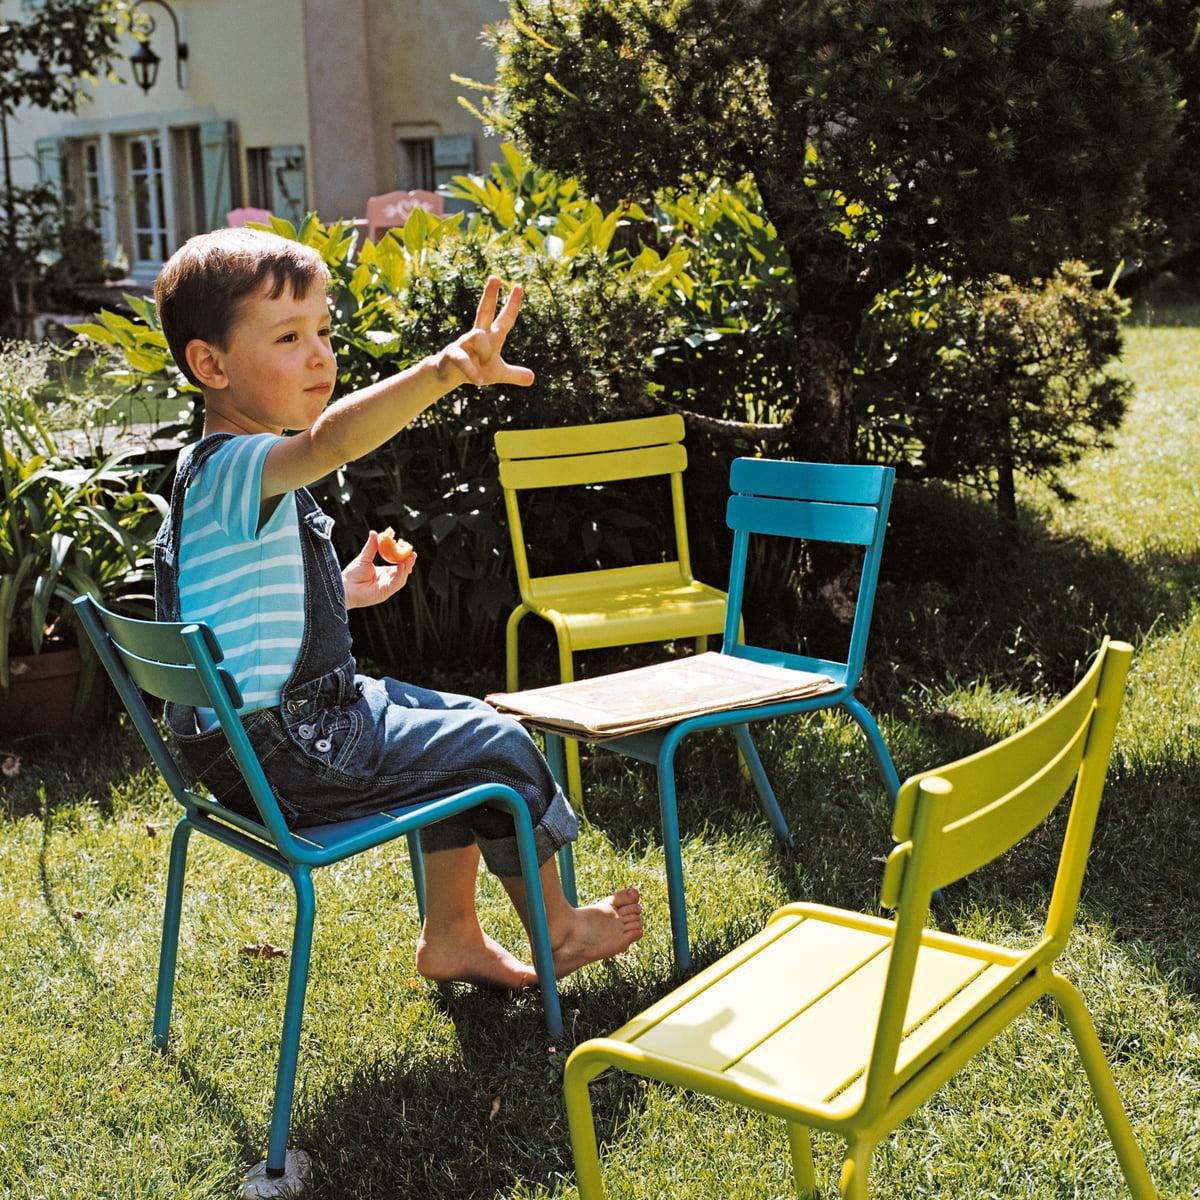 luxembourg kid kinderstuhl von fermob connox. Black Bedroom Furniture Sets. Home Design Ideas